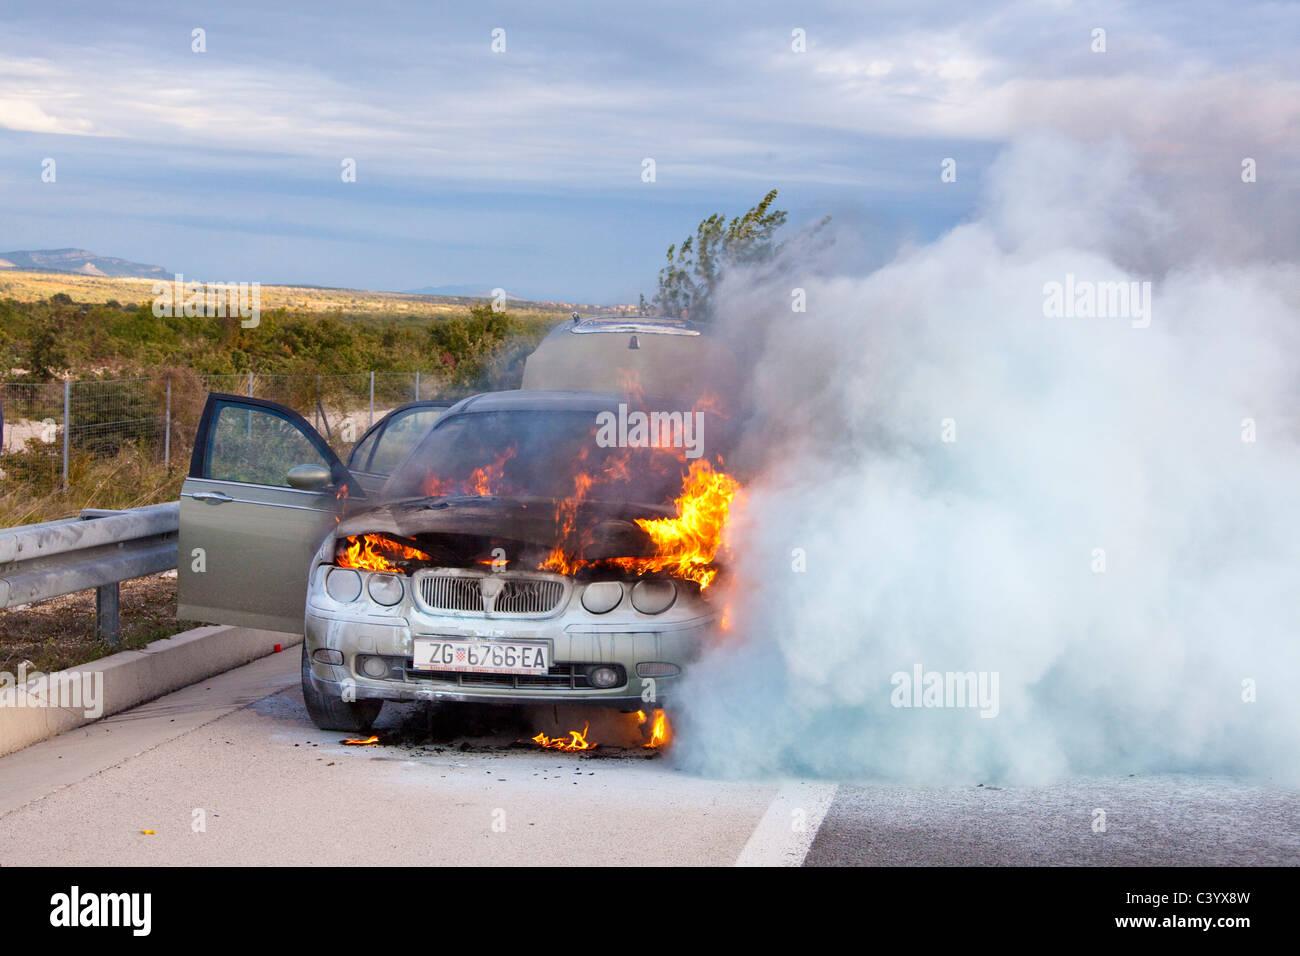 Kroatien, Europa, Unfall, Unfall, Auto, Automobil, brennen, Rauch, Straße Stockbild